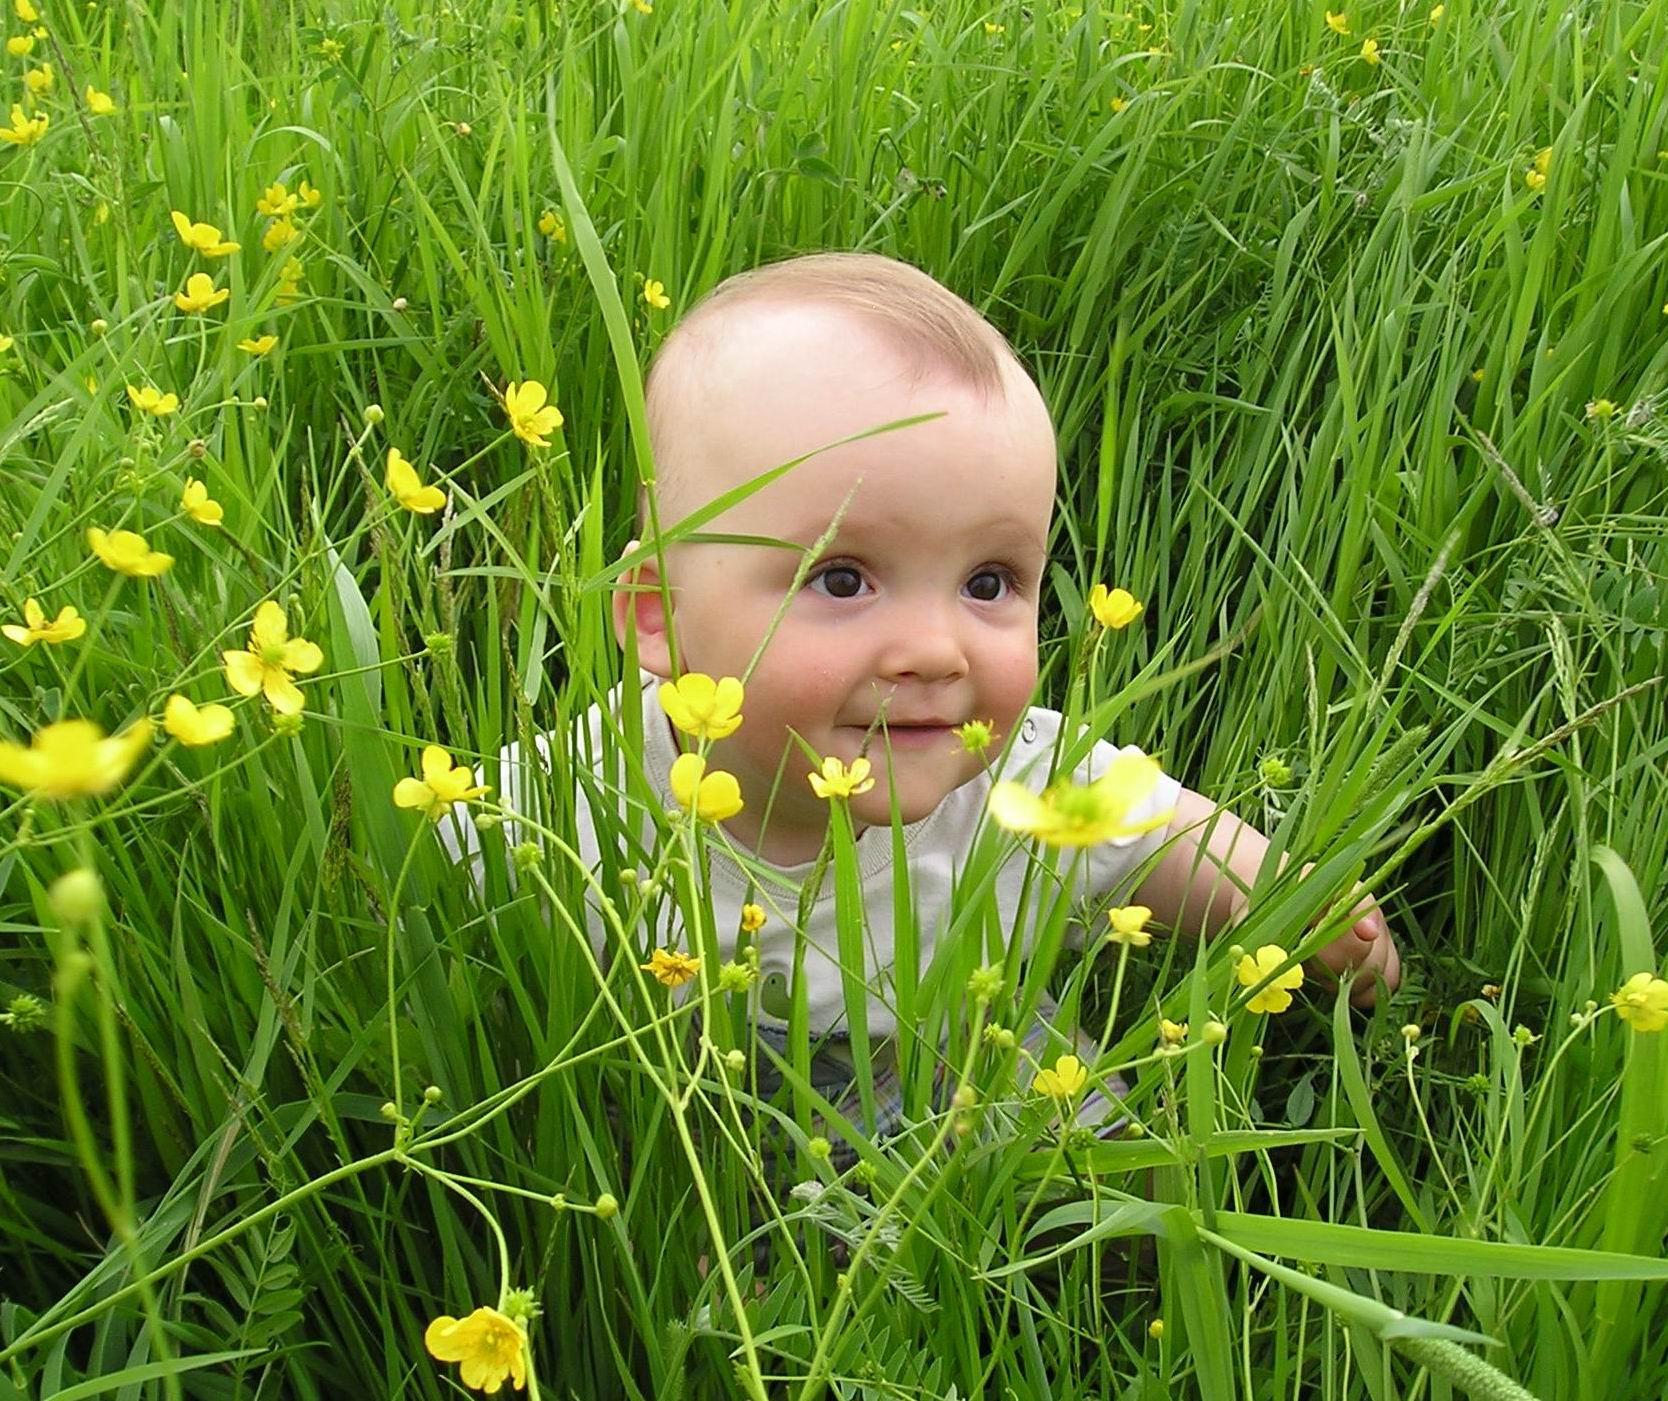 Наш цветочек. Лето, ах лето!..